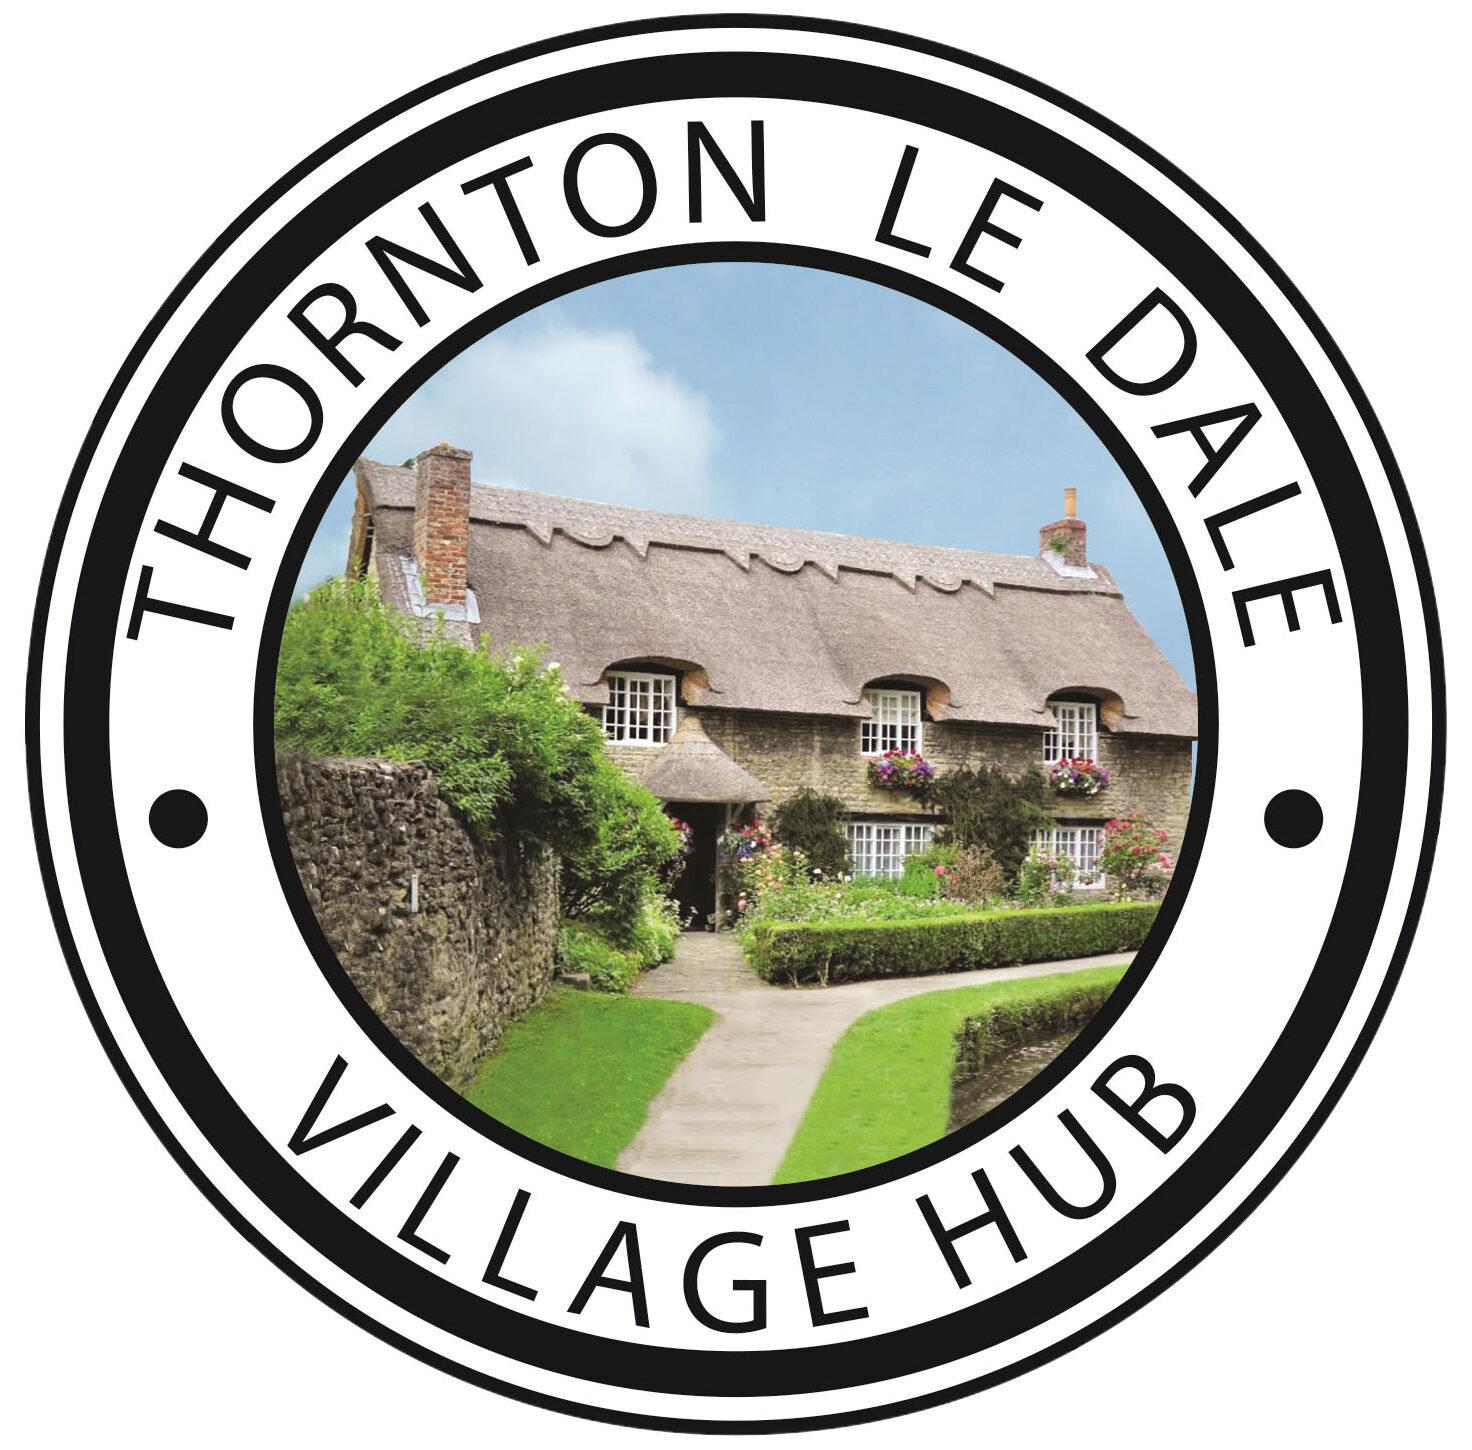 Thornton-le-Dale Village Hub